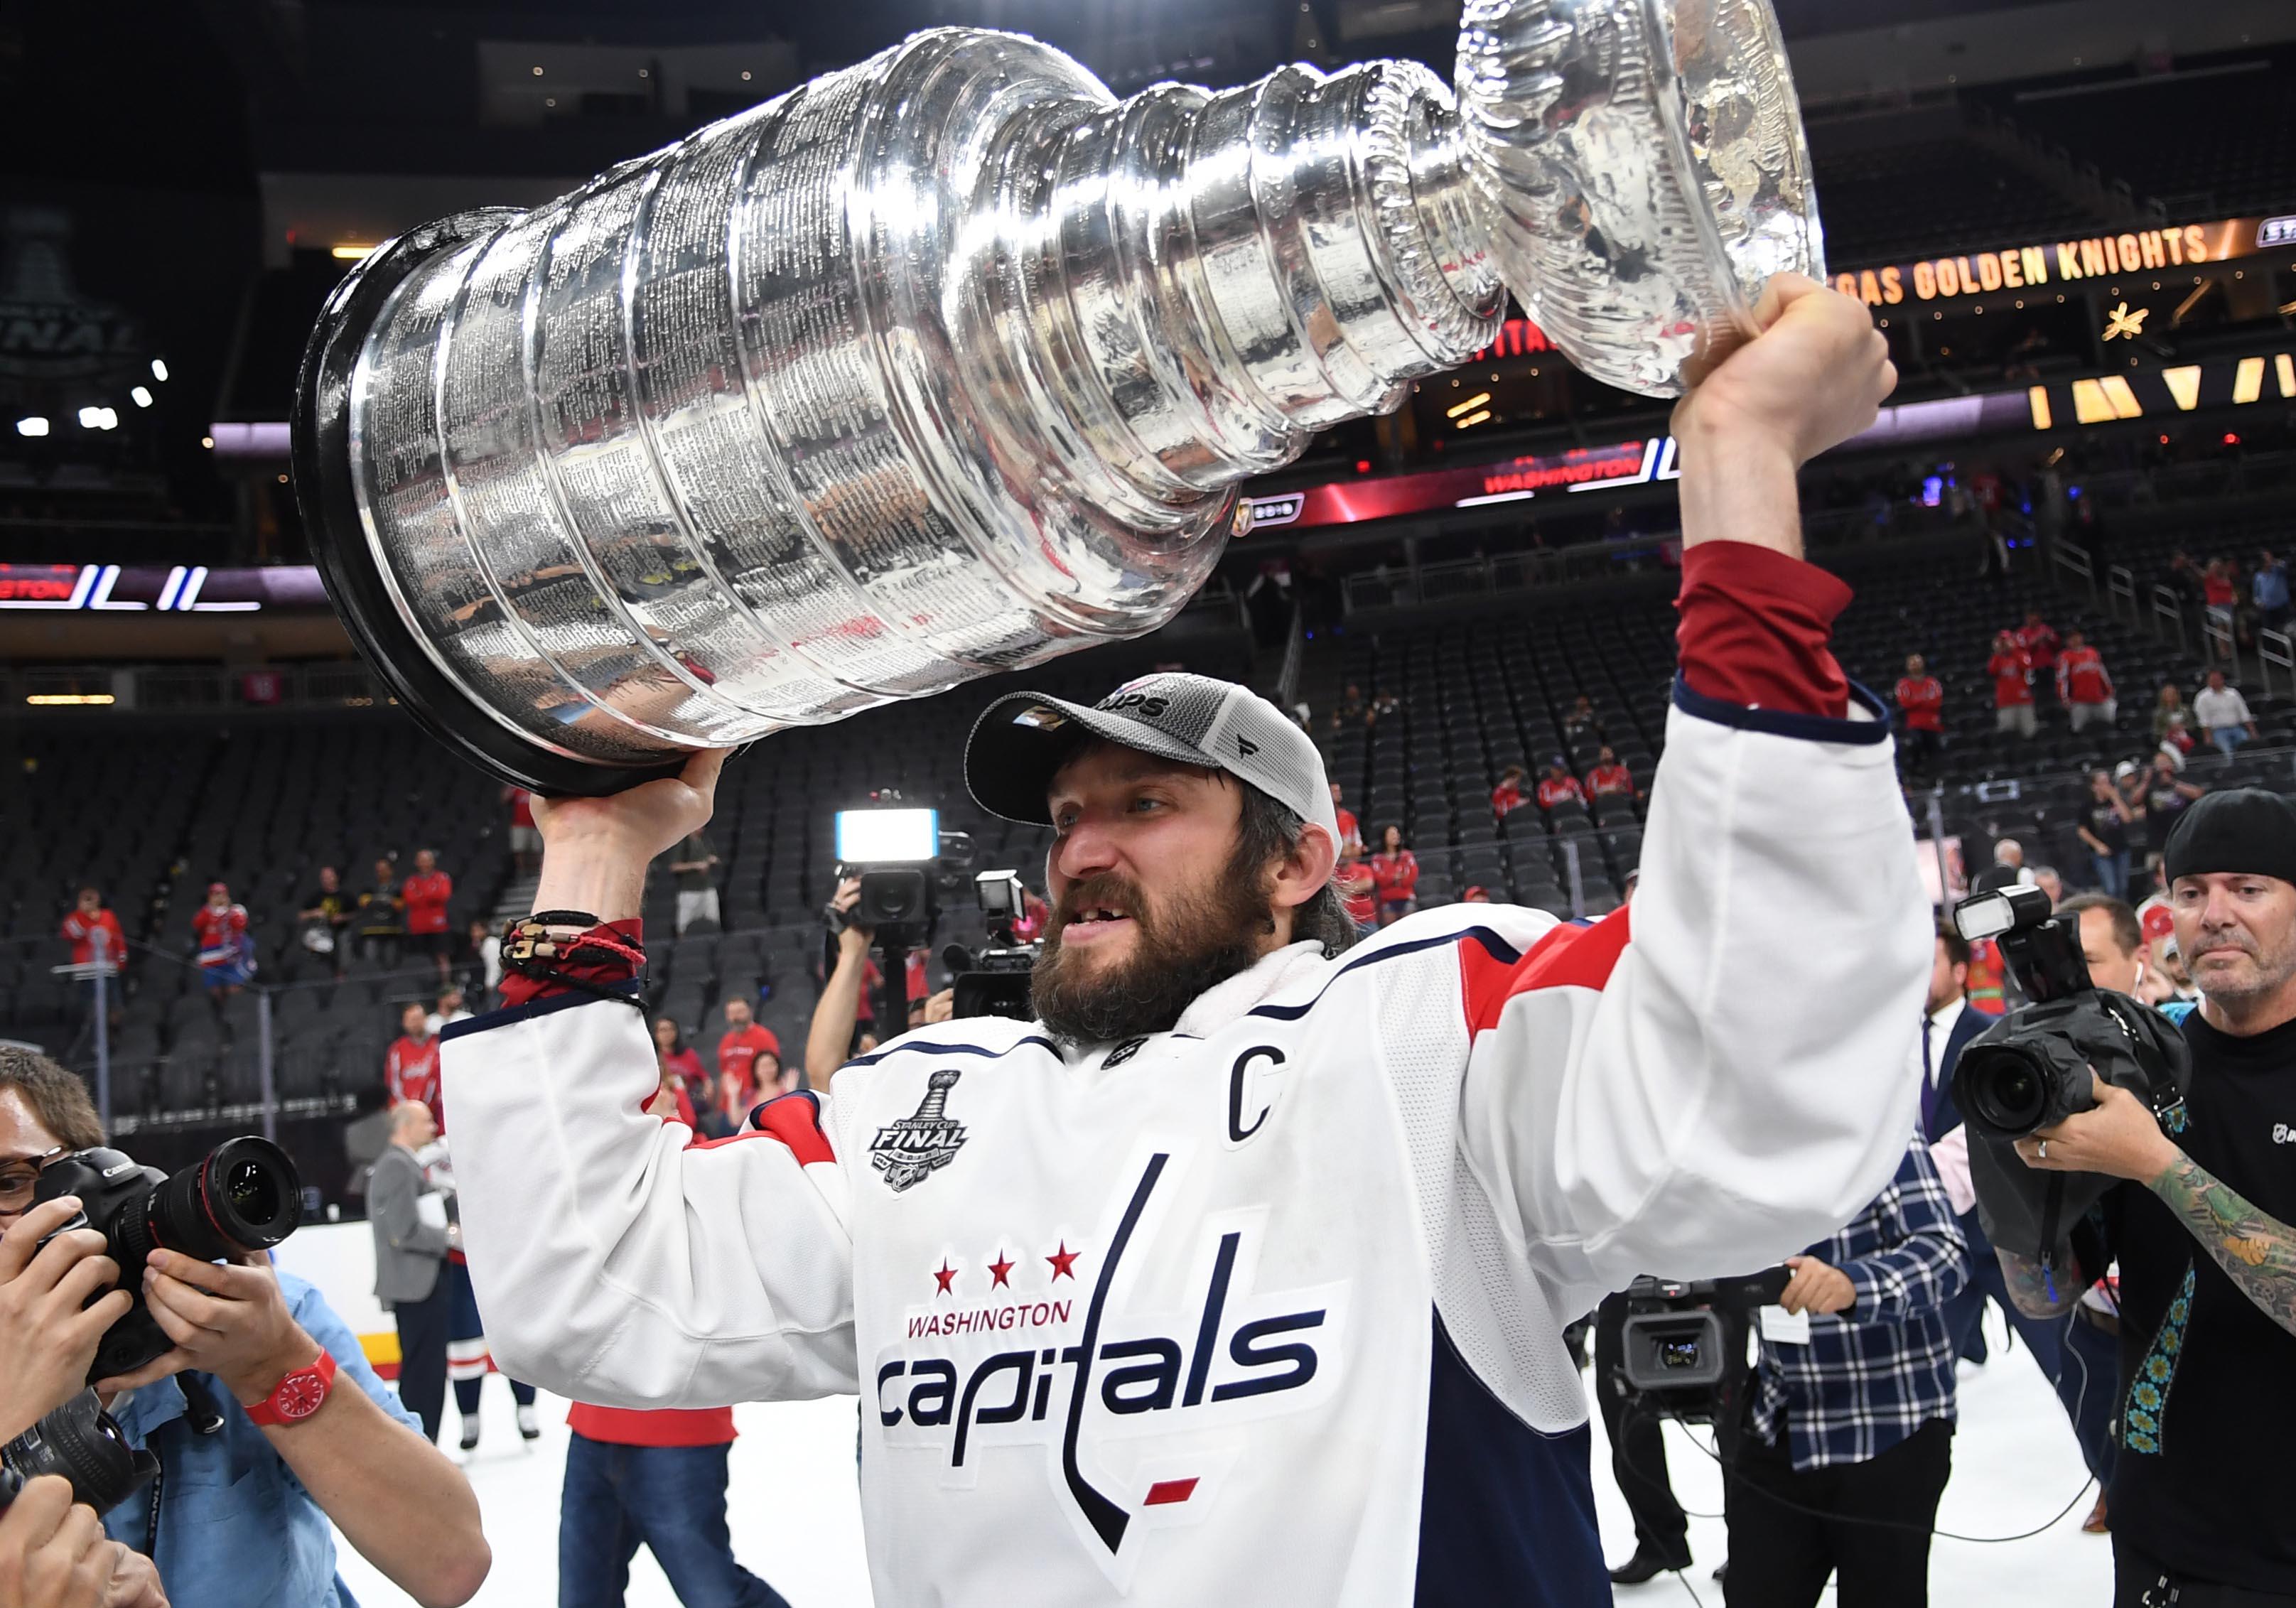 d4f9e2e3346 636640878872844956-USP-NHL-Stanley-Cup-Final-Washington -Capitals-at-100452739.JPG